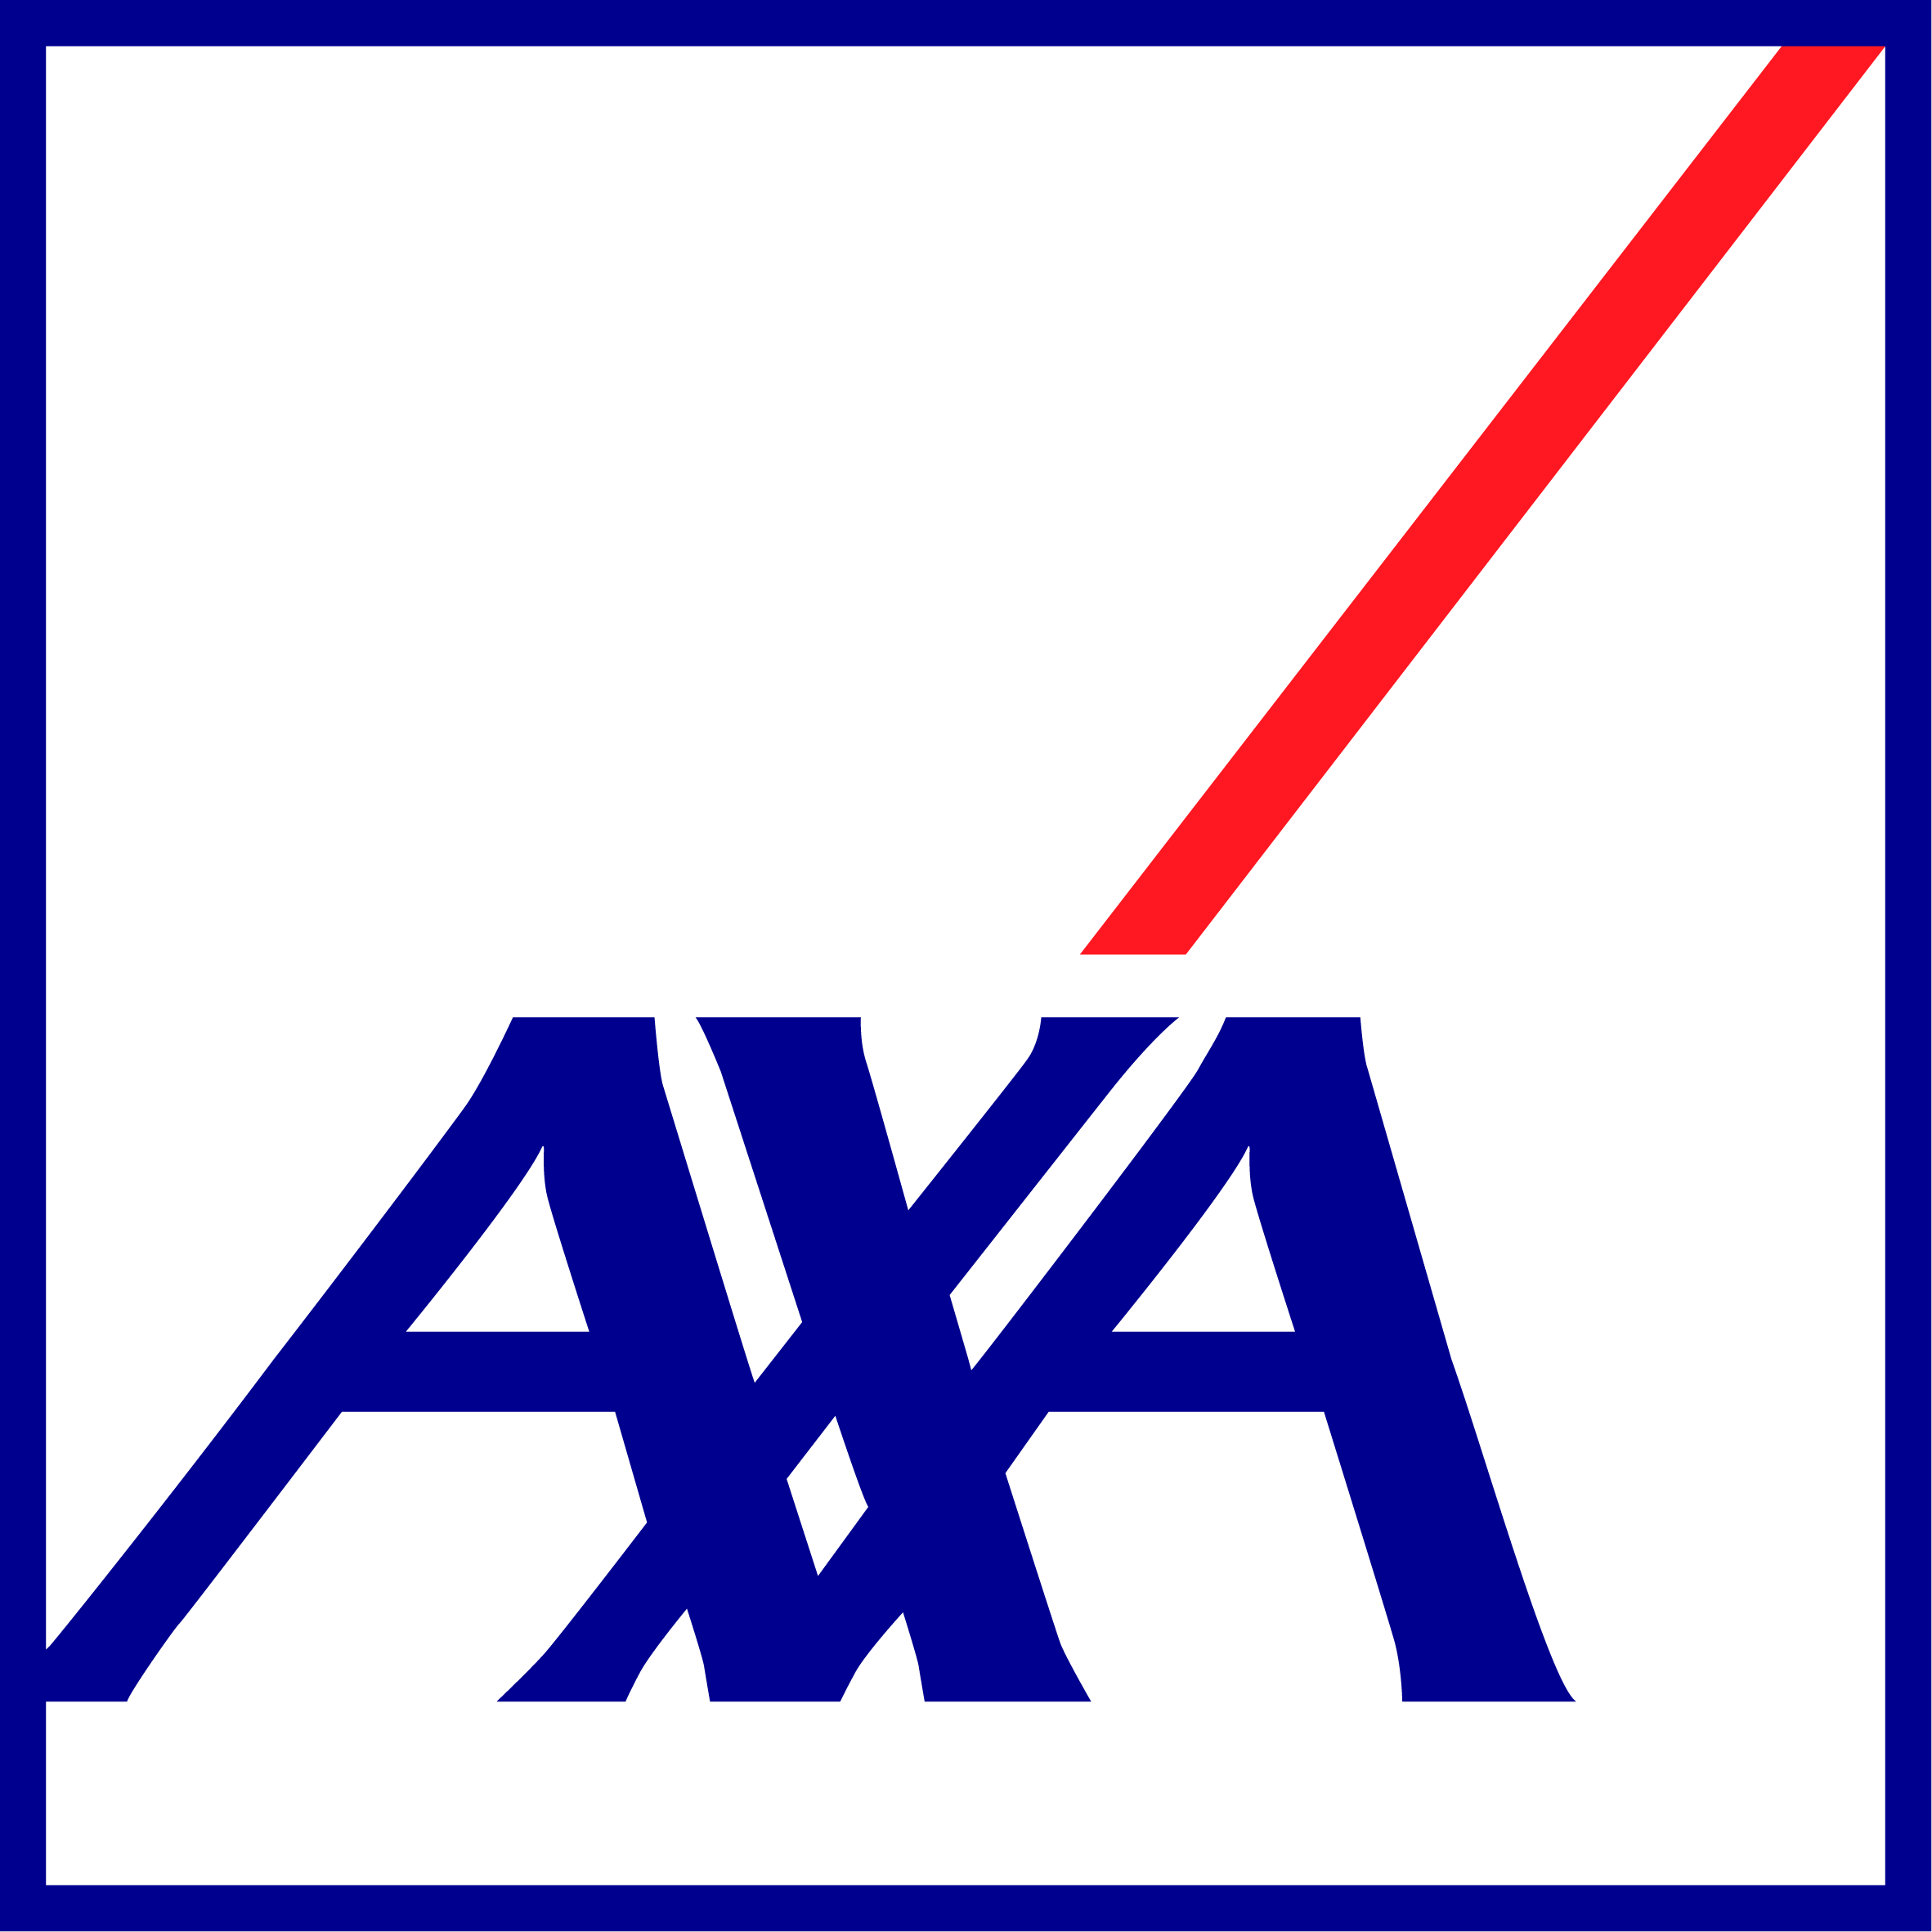 axa_logo_open_blue_rgb (2)